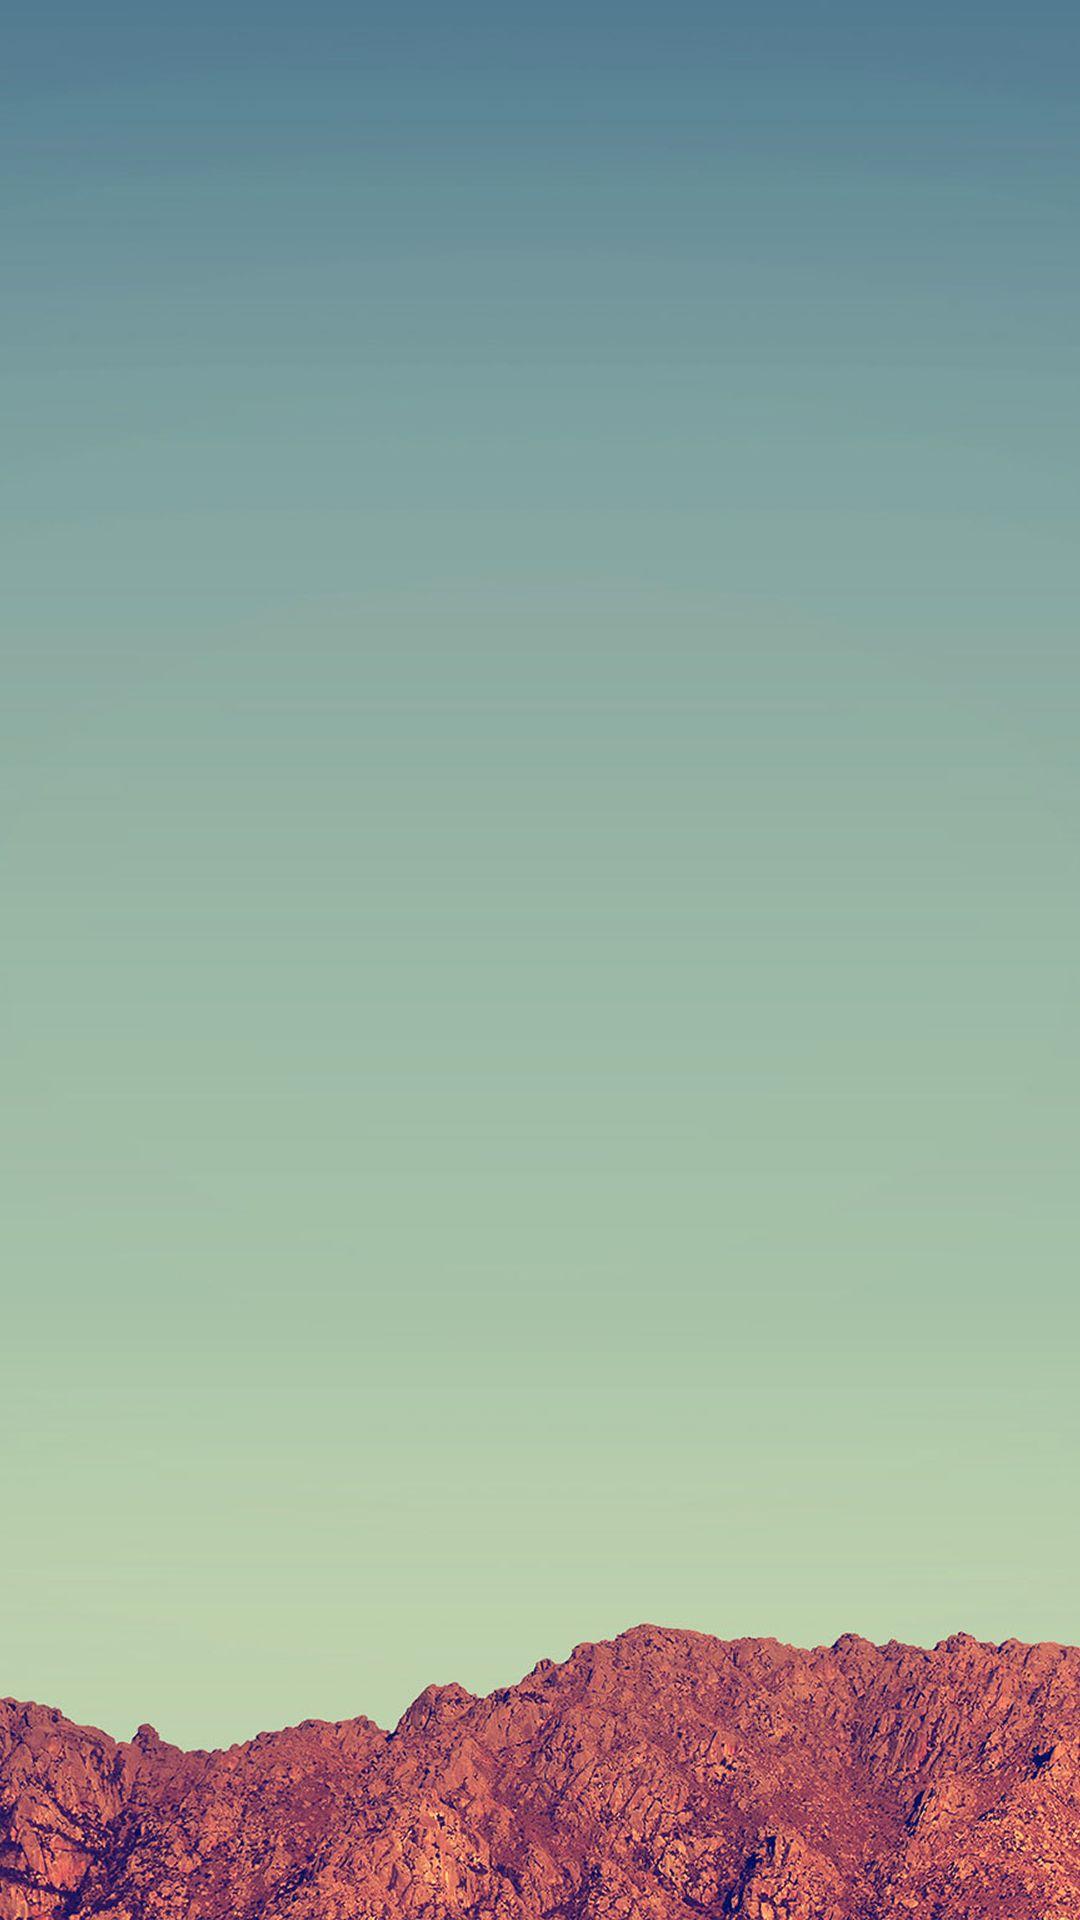 Pure Minimal Rock Mountain Blue Sky Iphone 7 Wallpaper